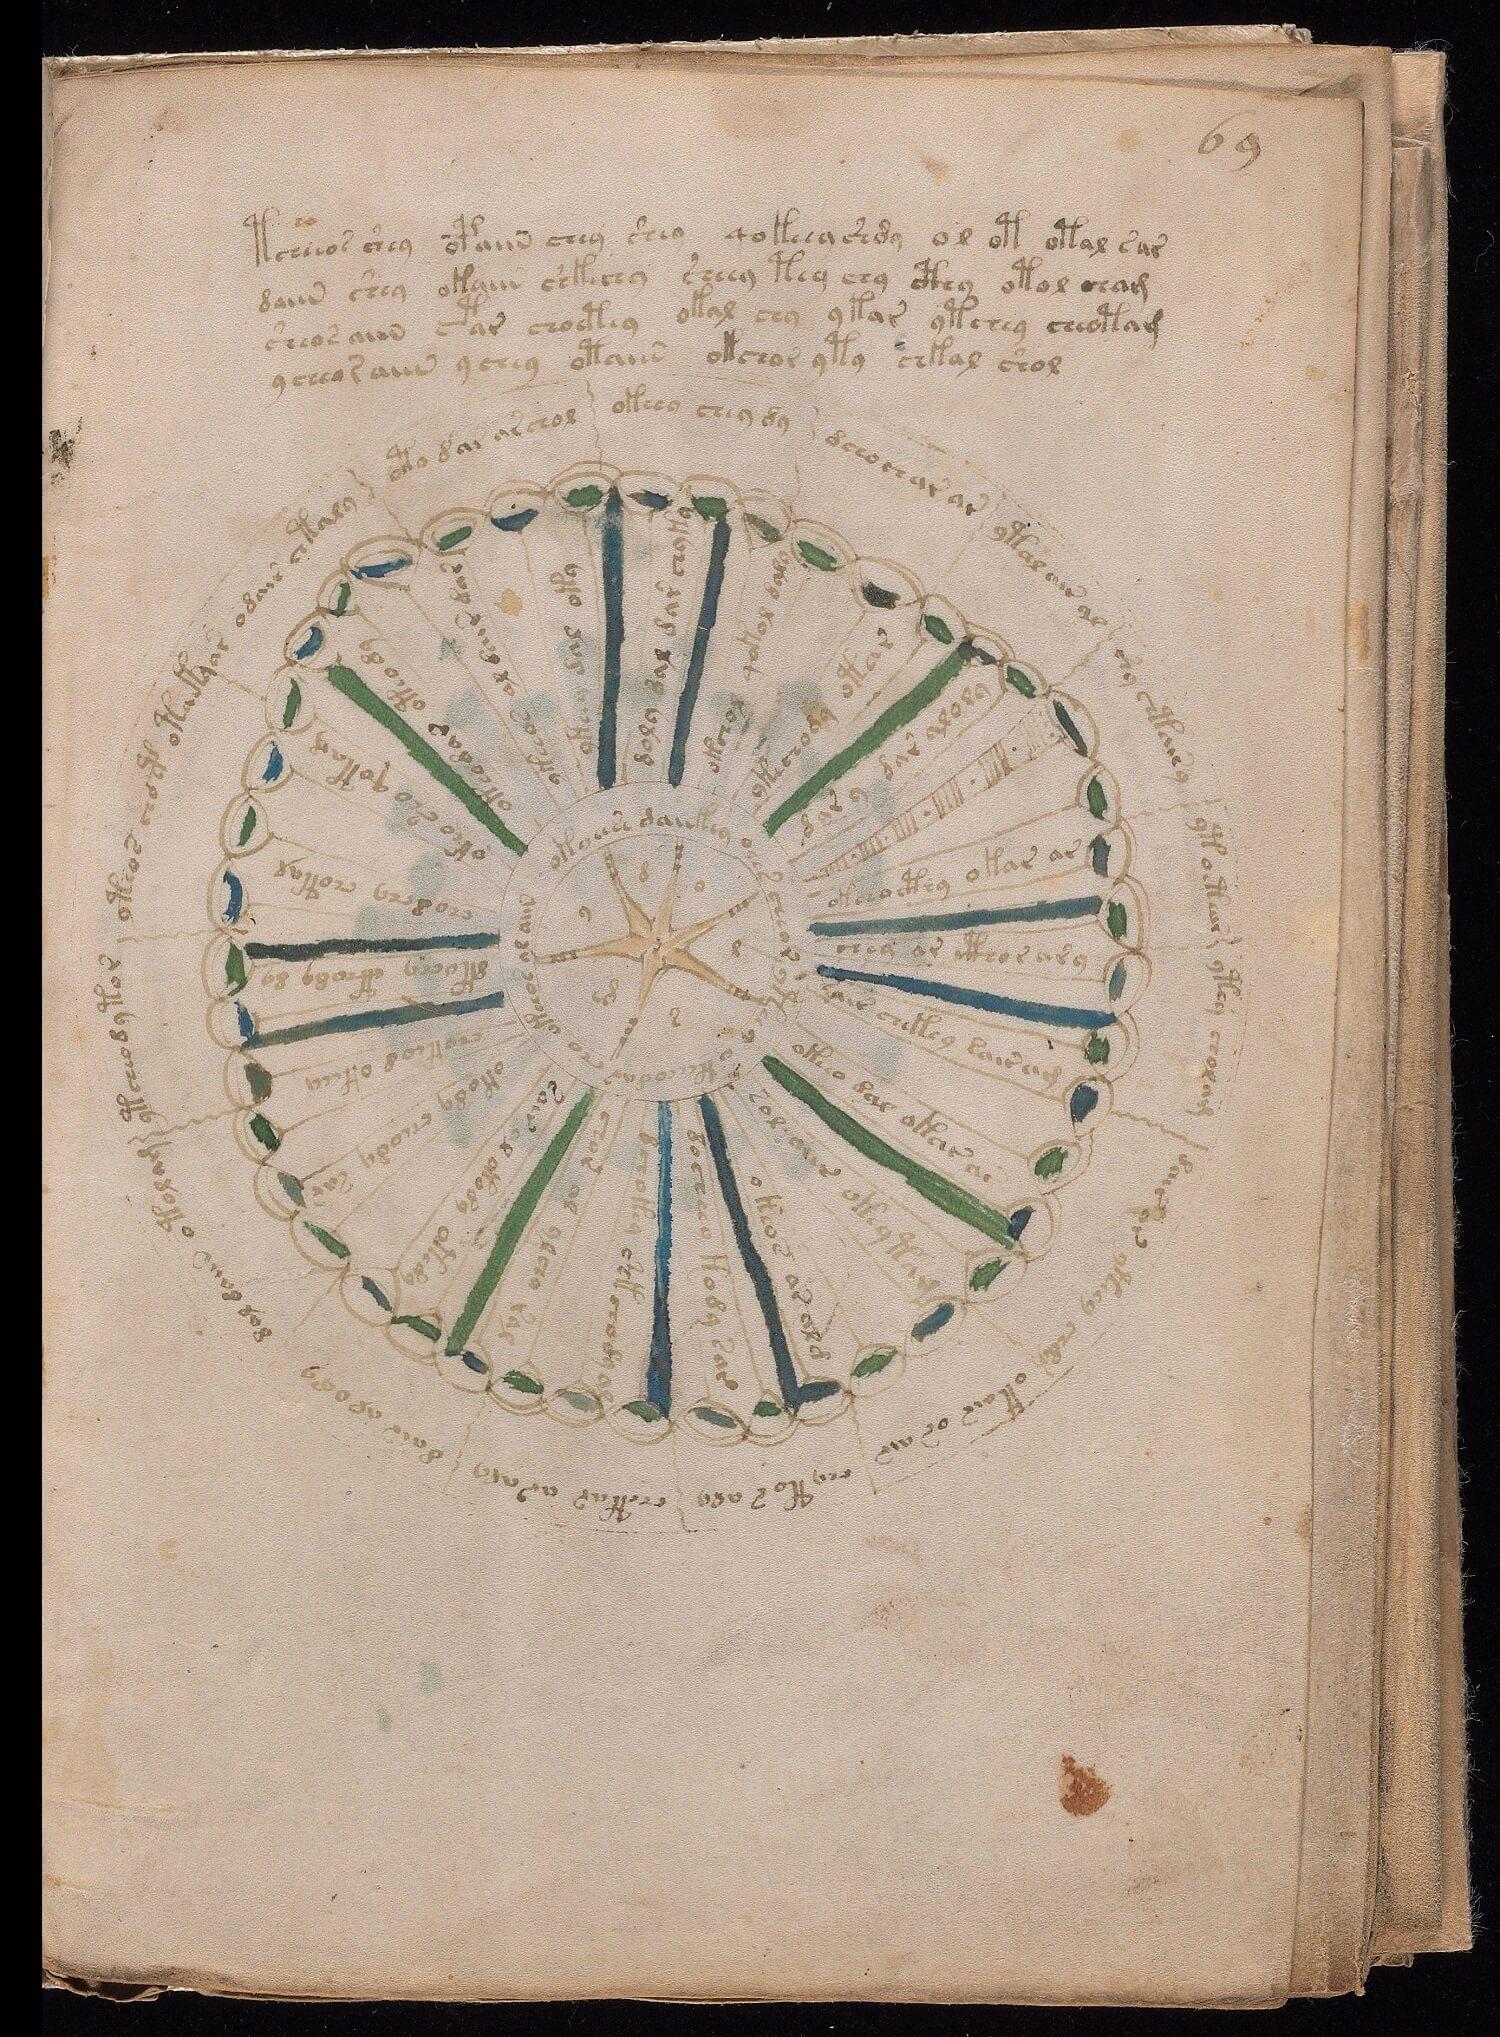 Foglio 69r, Yale University Library